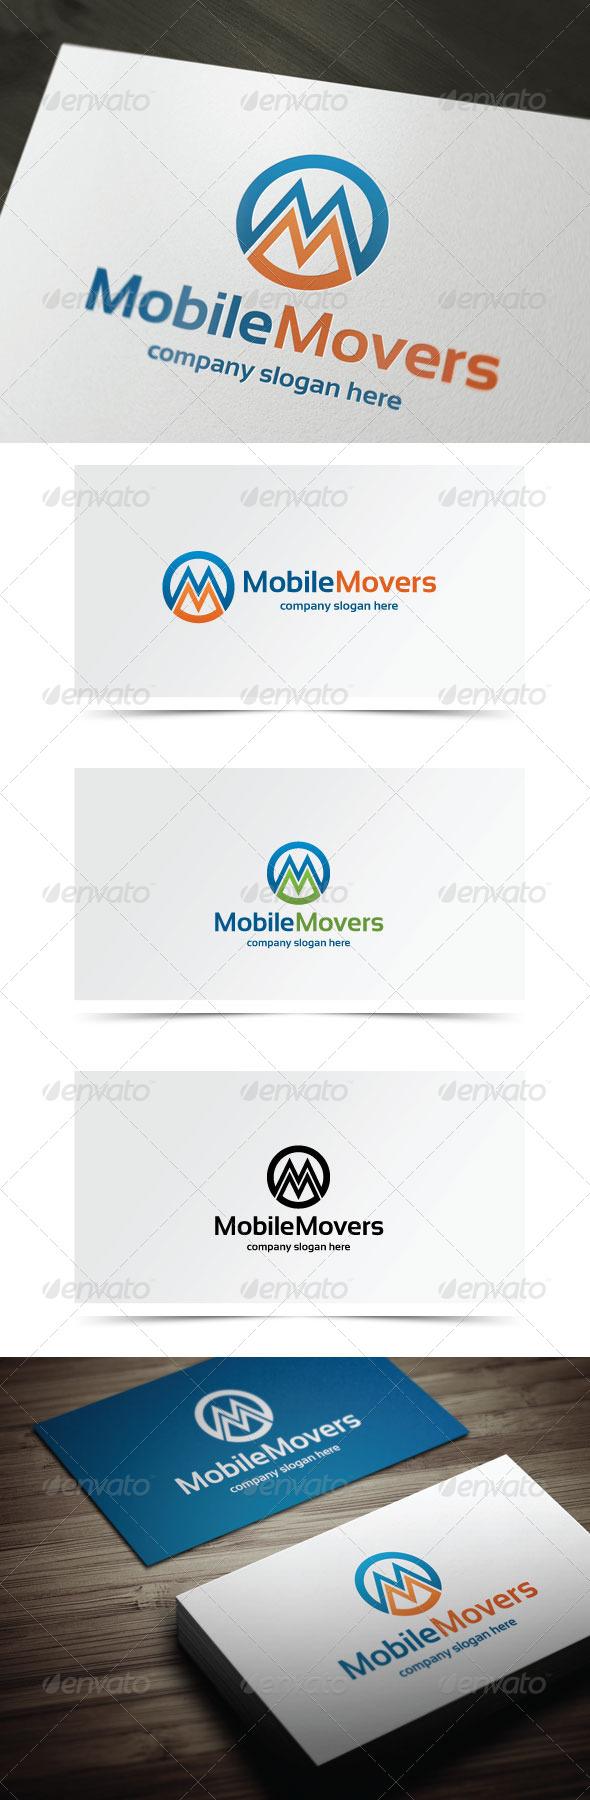 GraphicRiver Mobile Movers 6021098